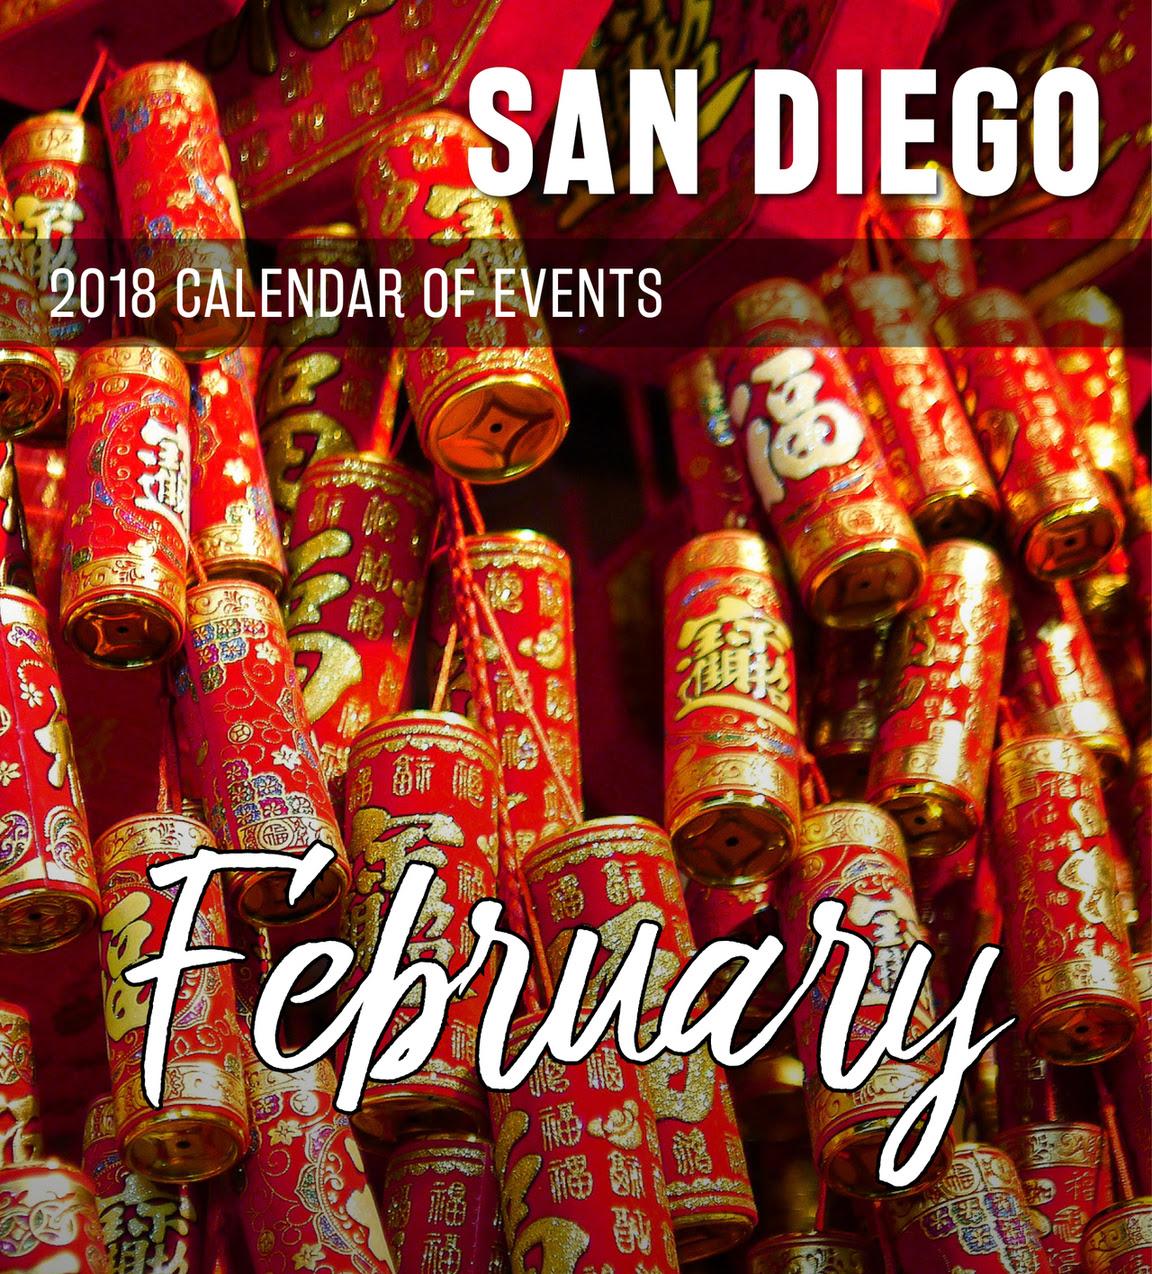 San Diego February 2018 Calendar of Events